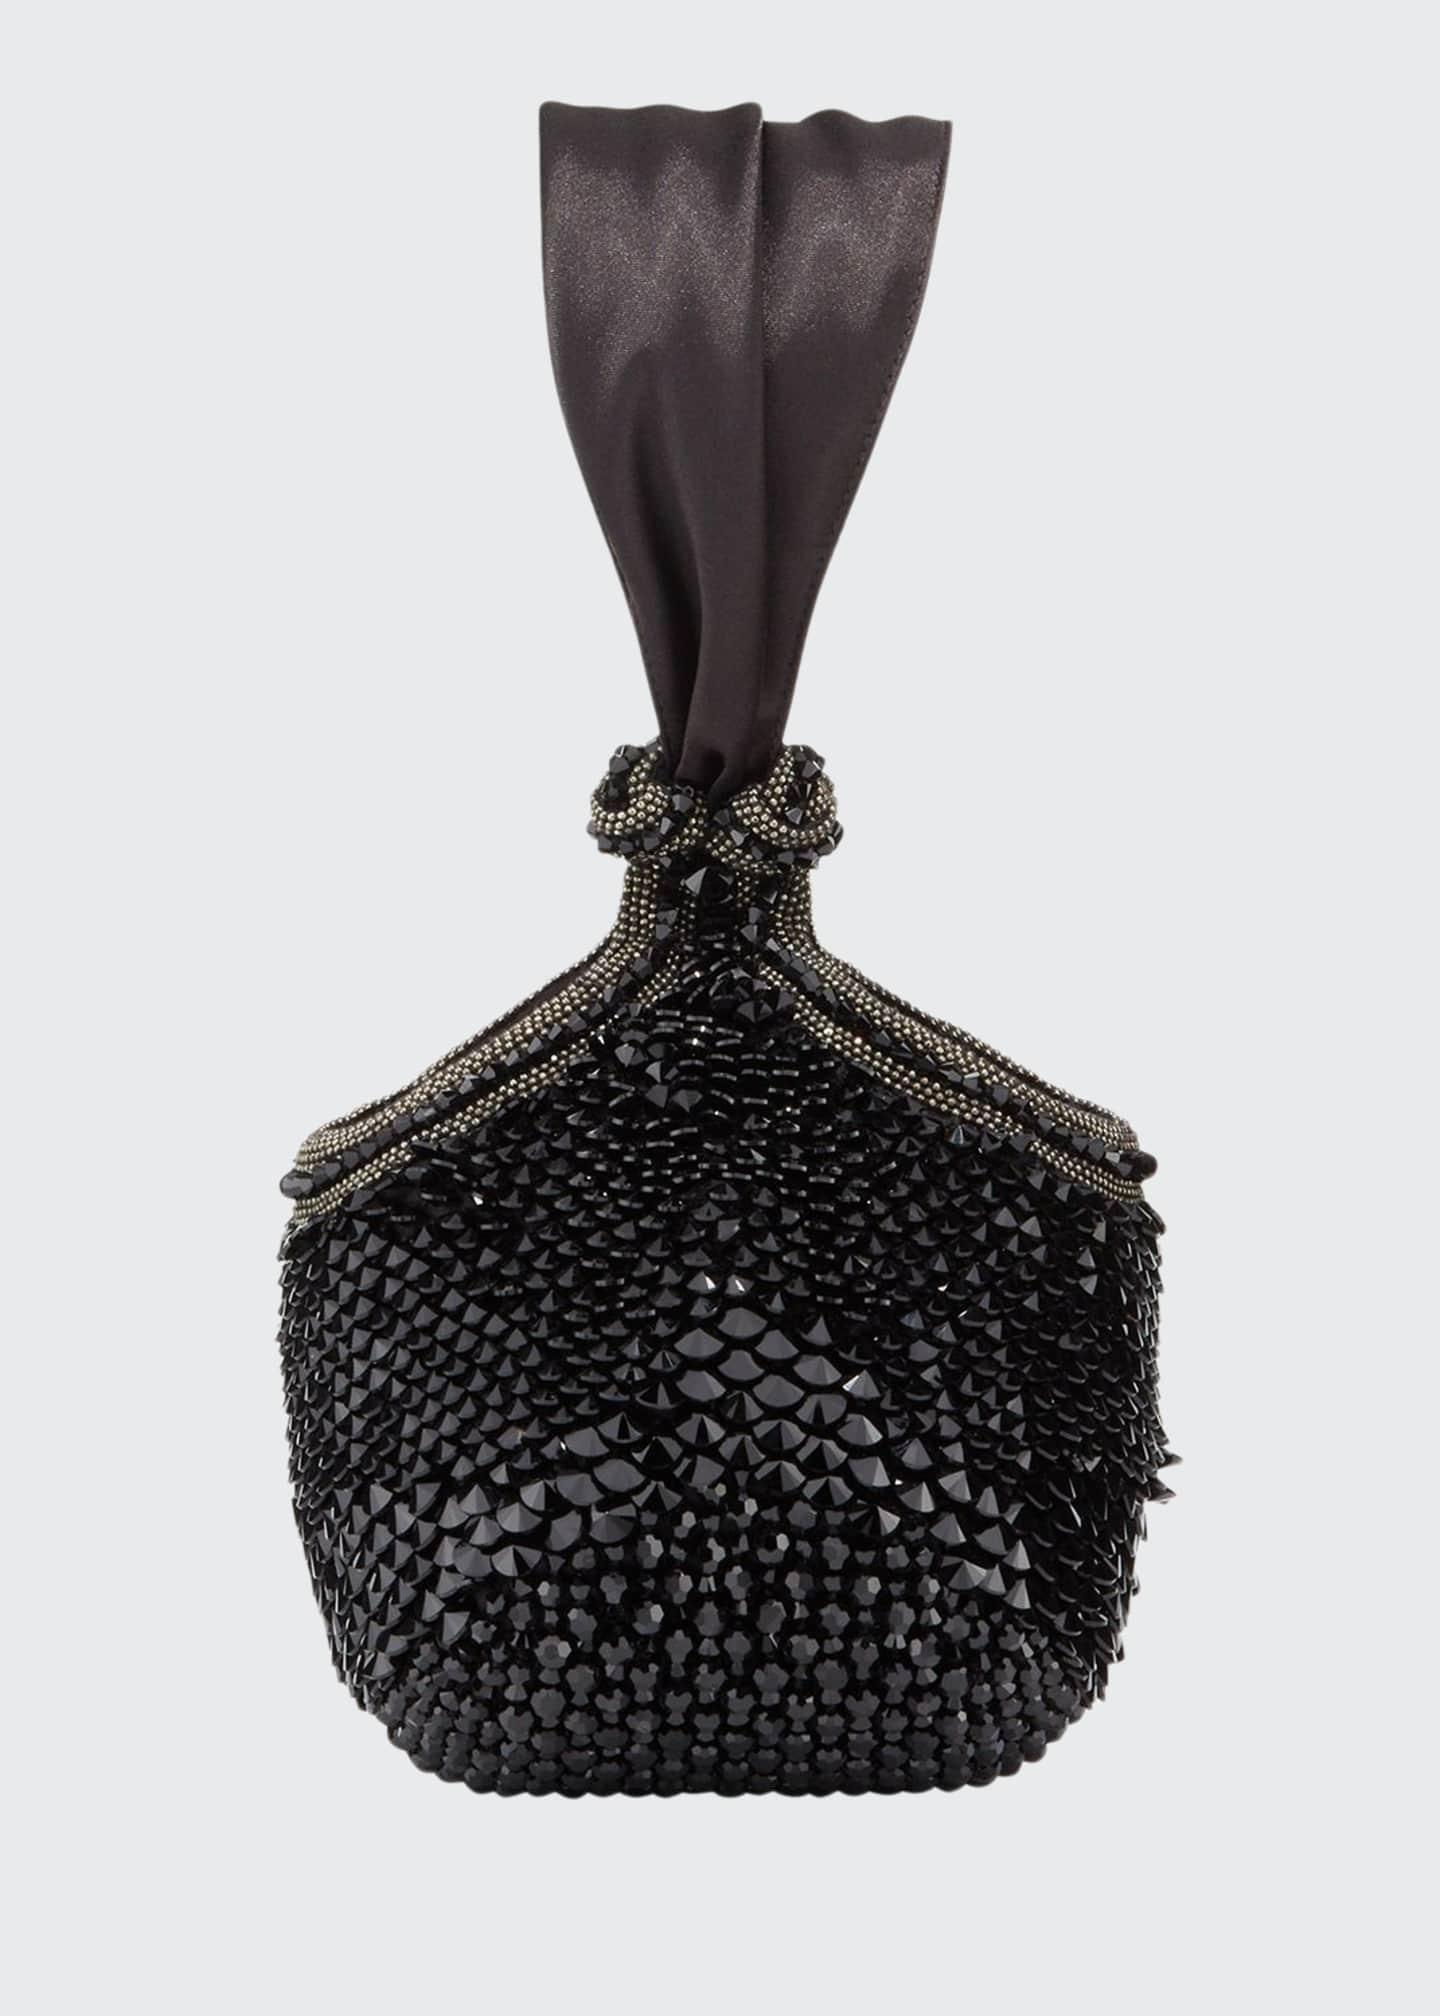 Bea Valdes Bella Jeweled Satin Clutch Bag